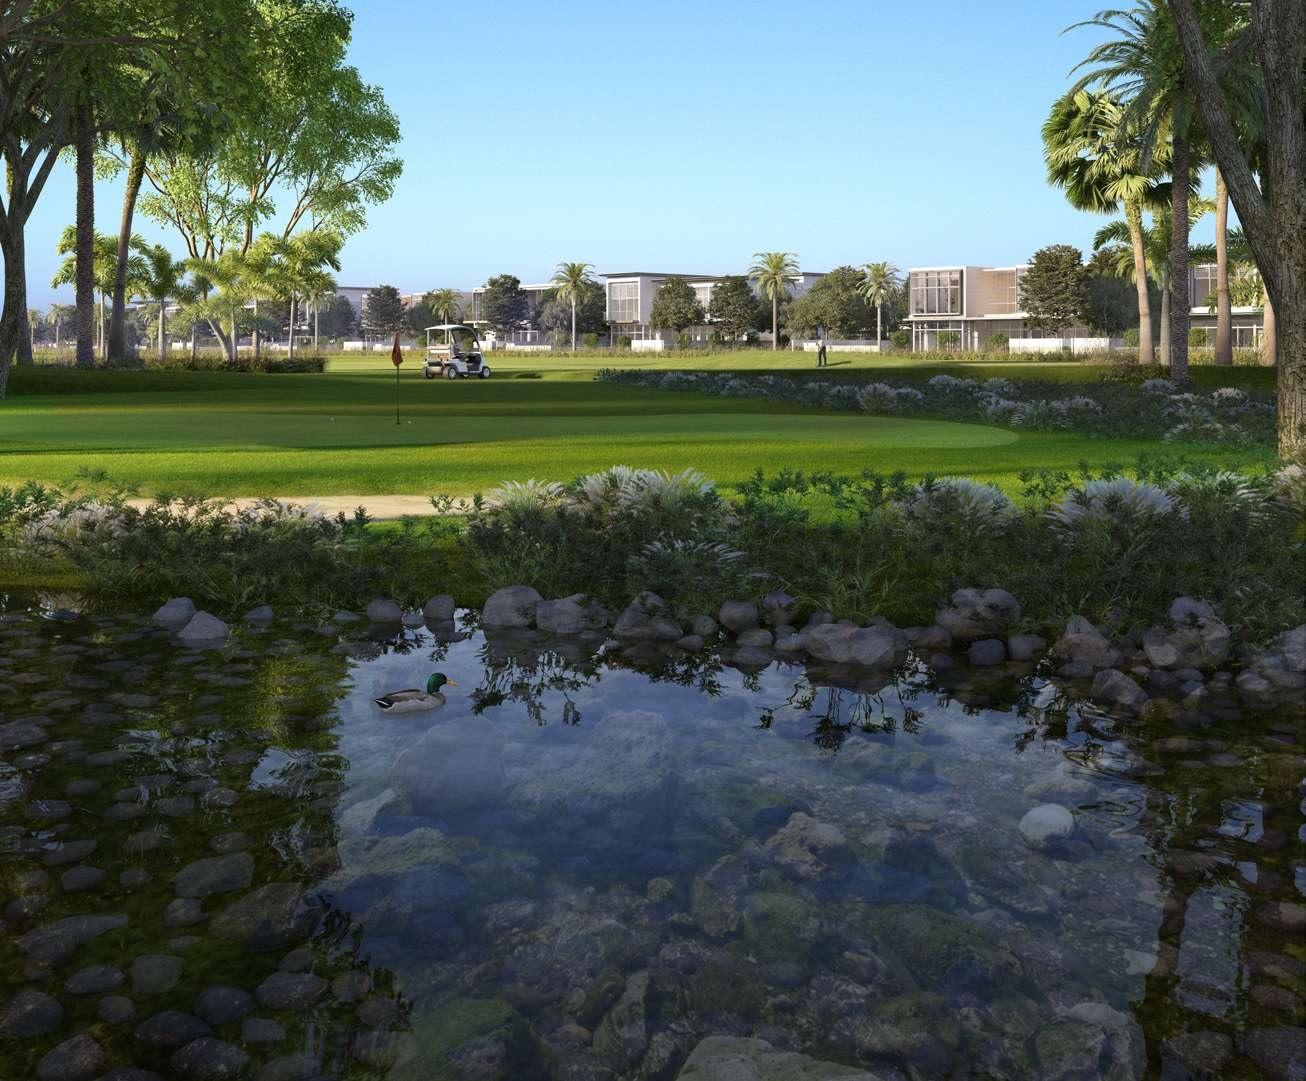 GOLF PLACE AT DUBAI HILLS